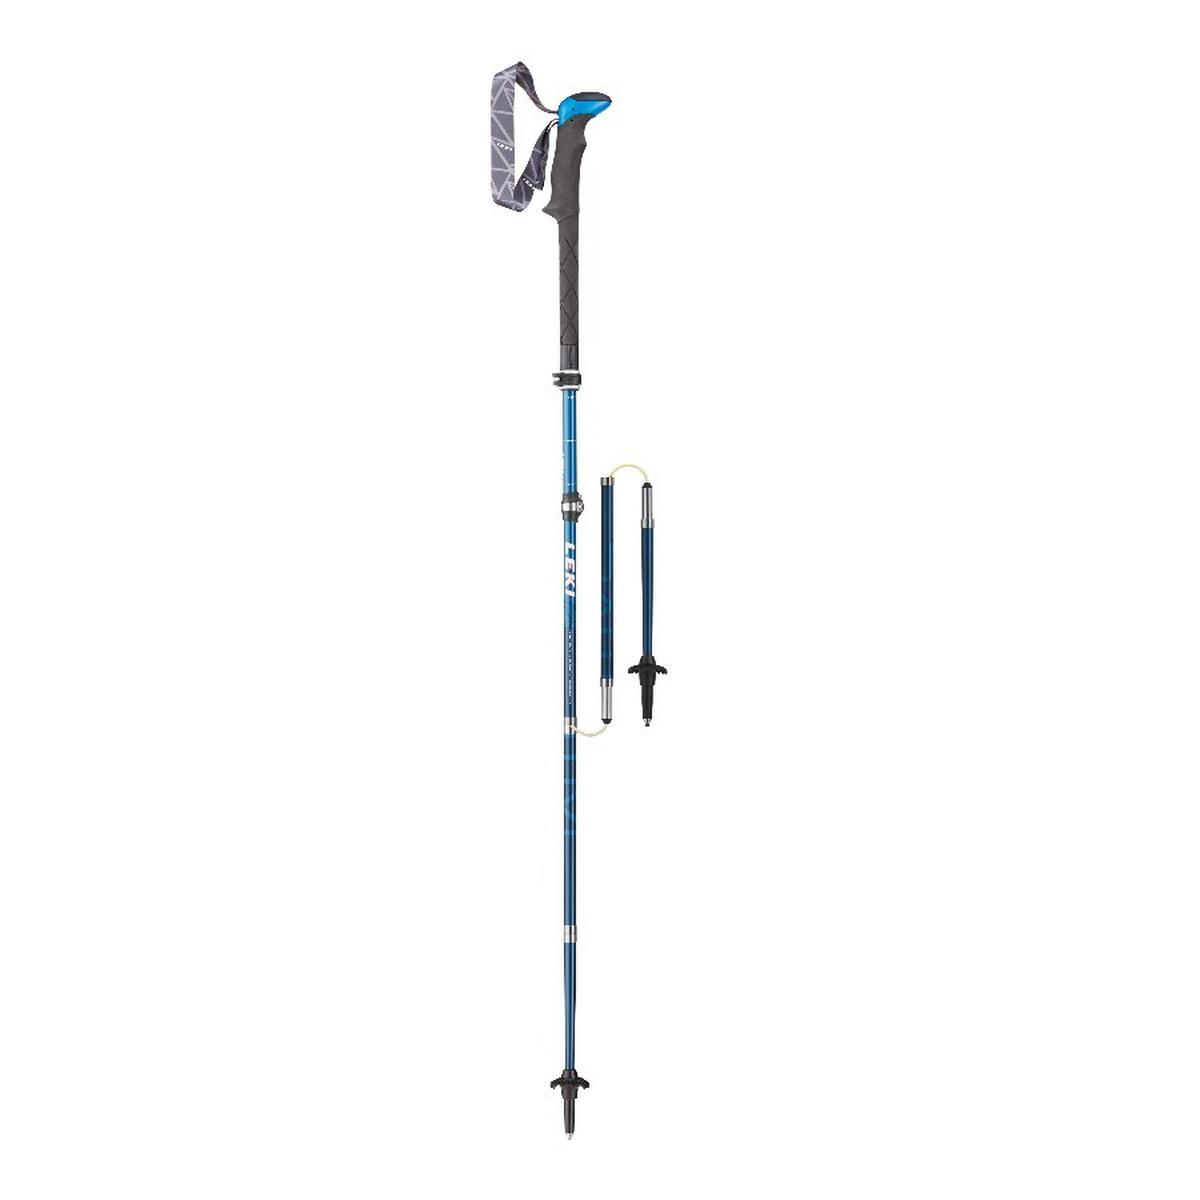 Leki Trekking Poles Micro Vario Carbon (PAIR)